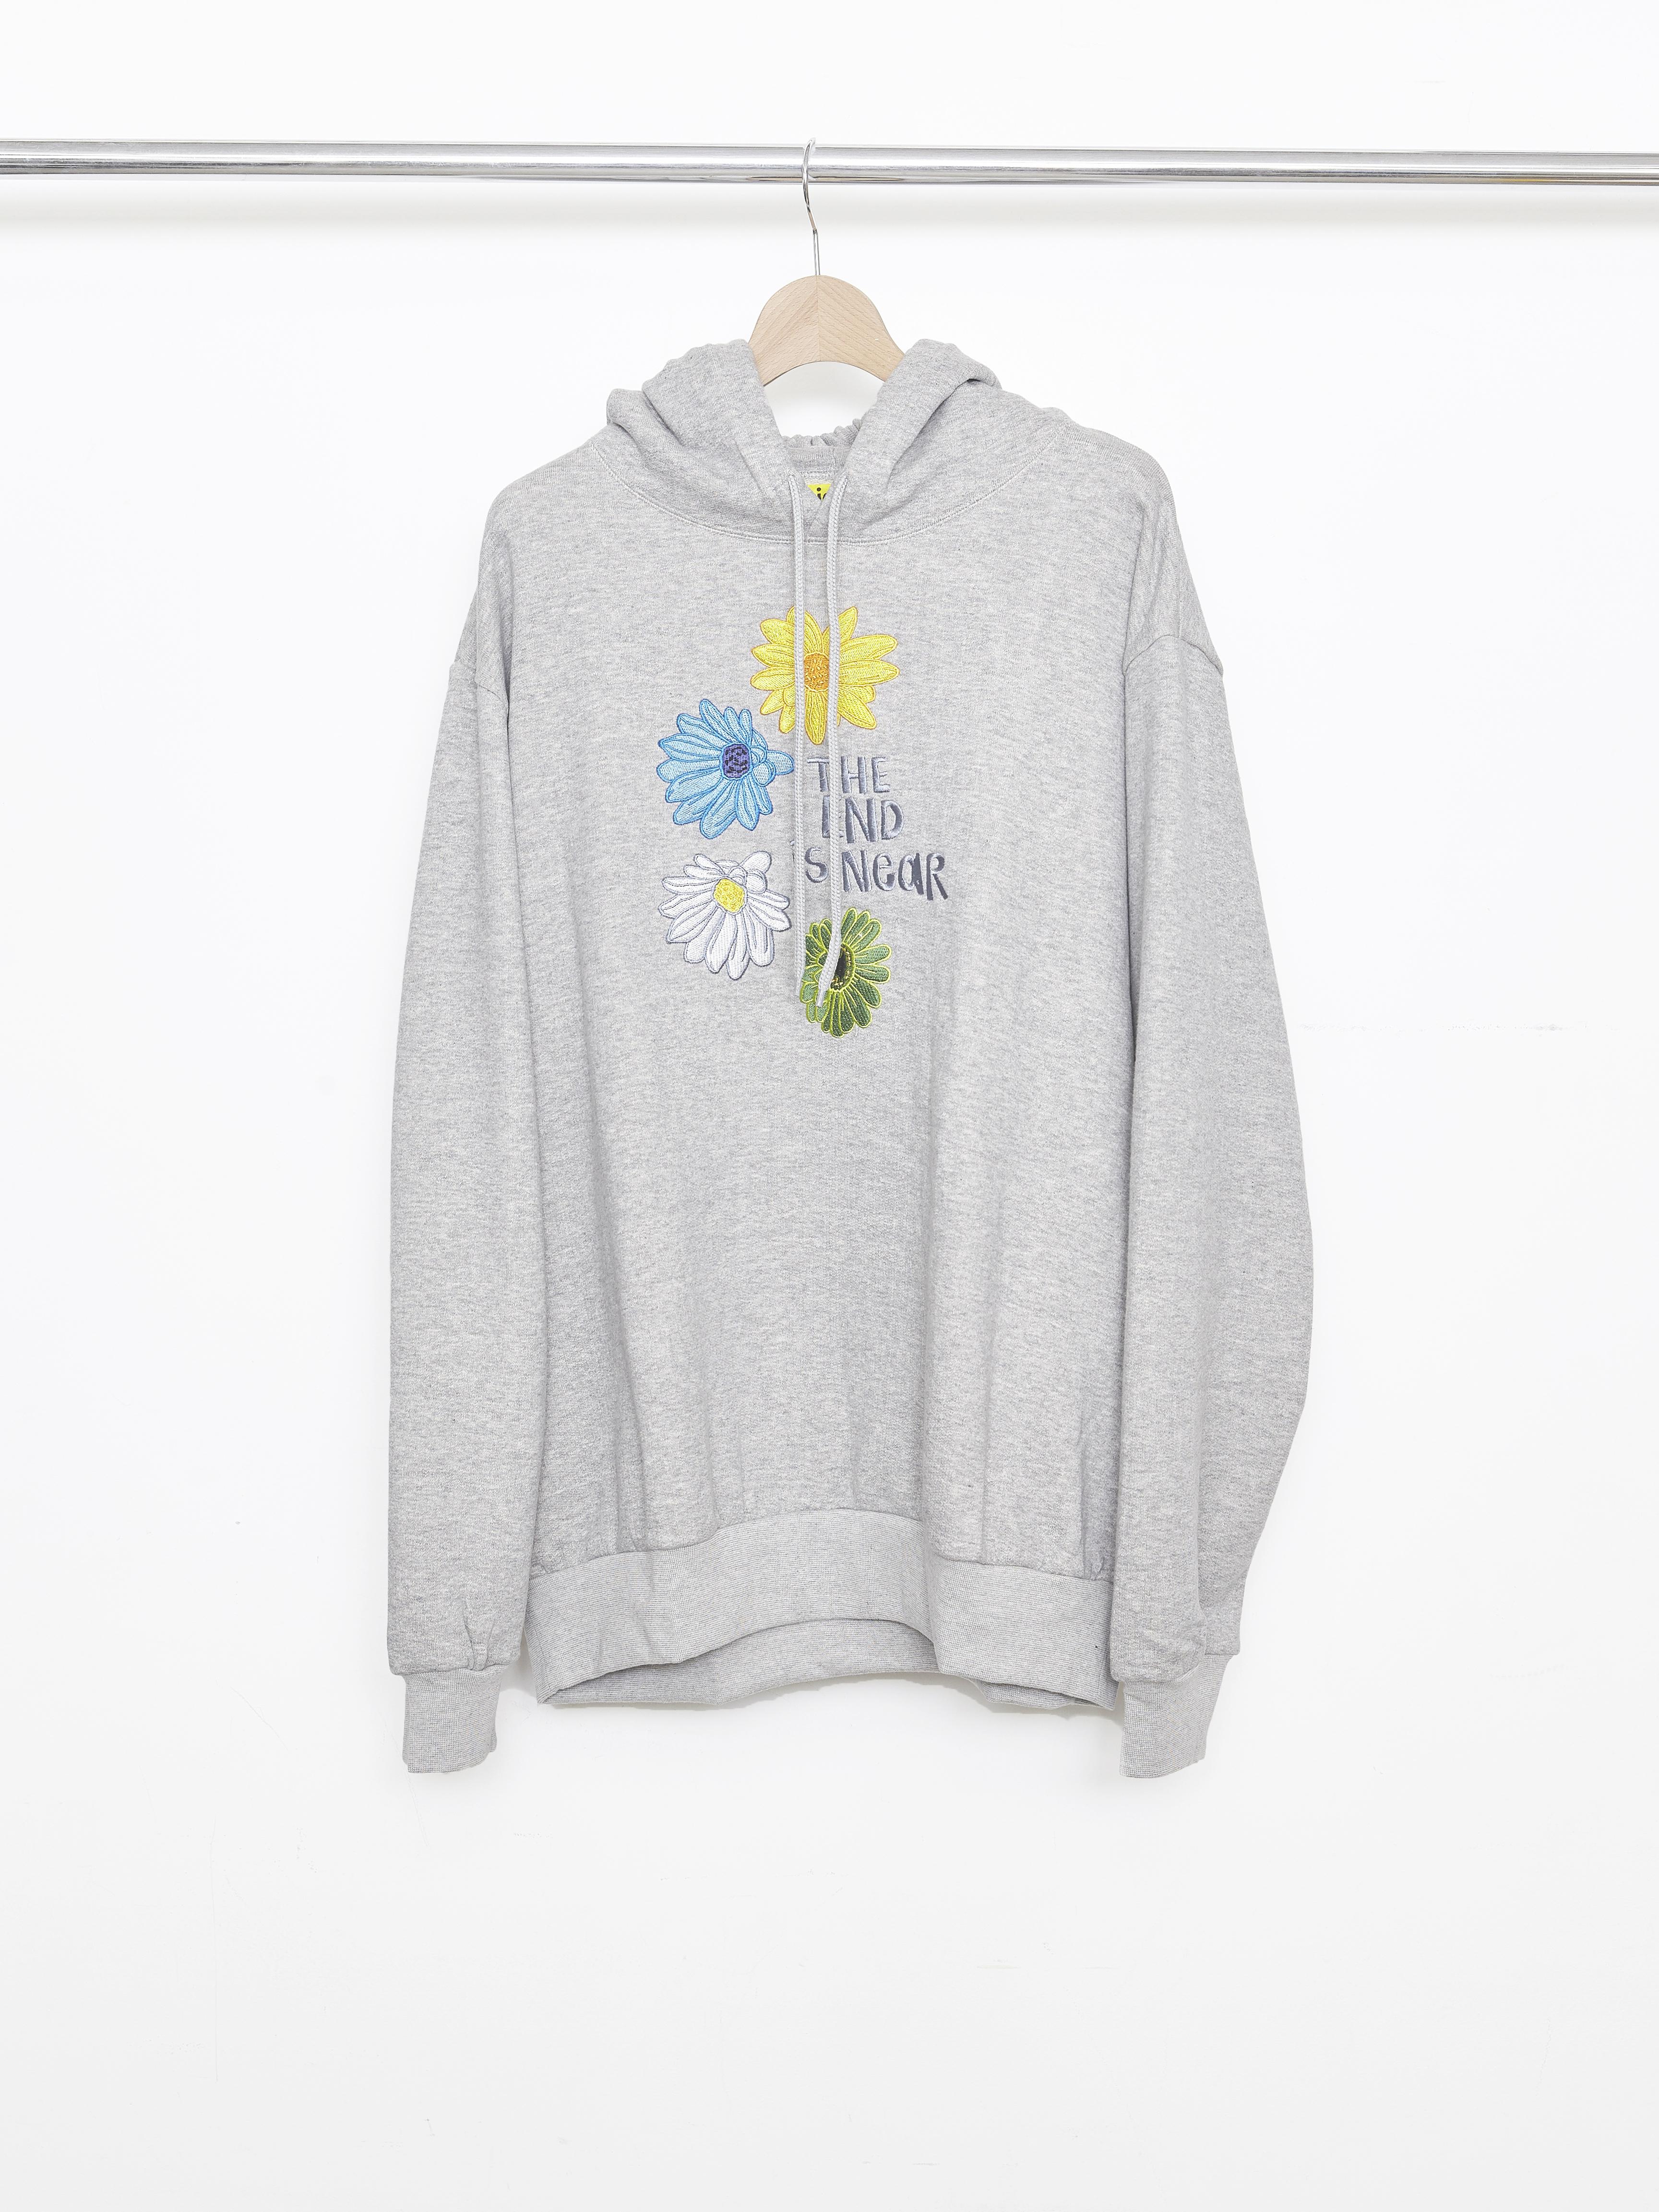 Allege×iggy Flower Hoodie - Gray